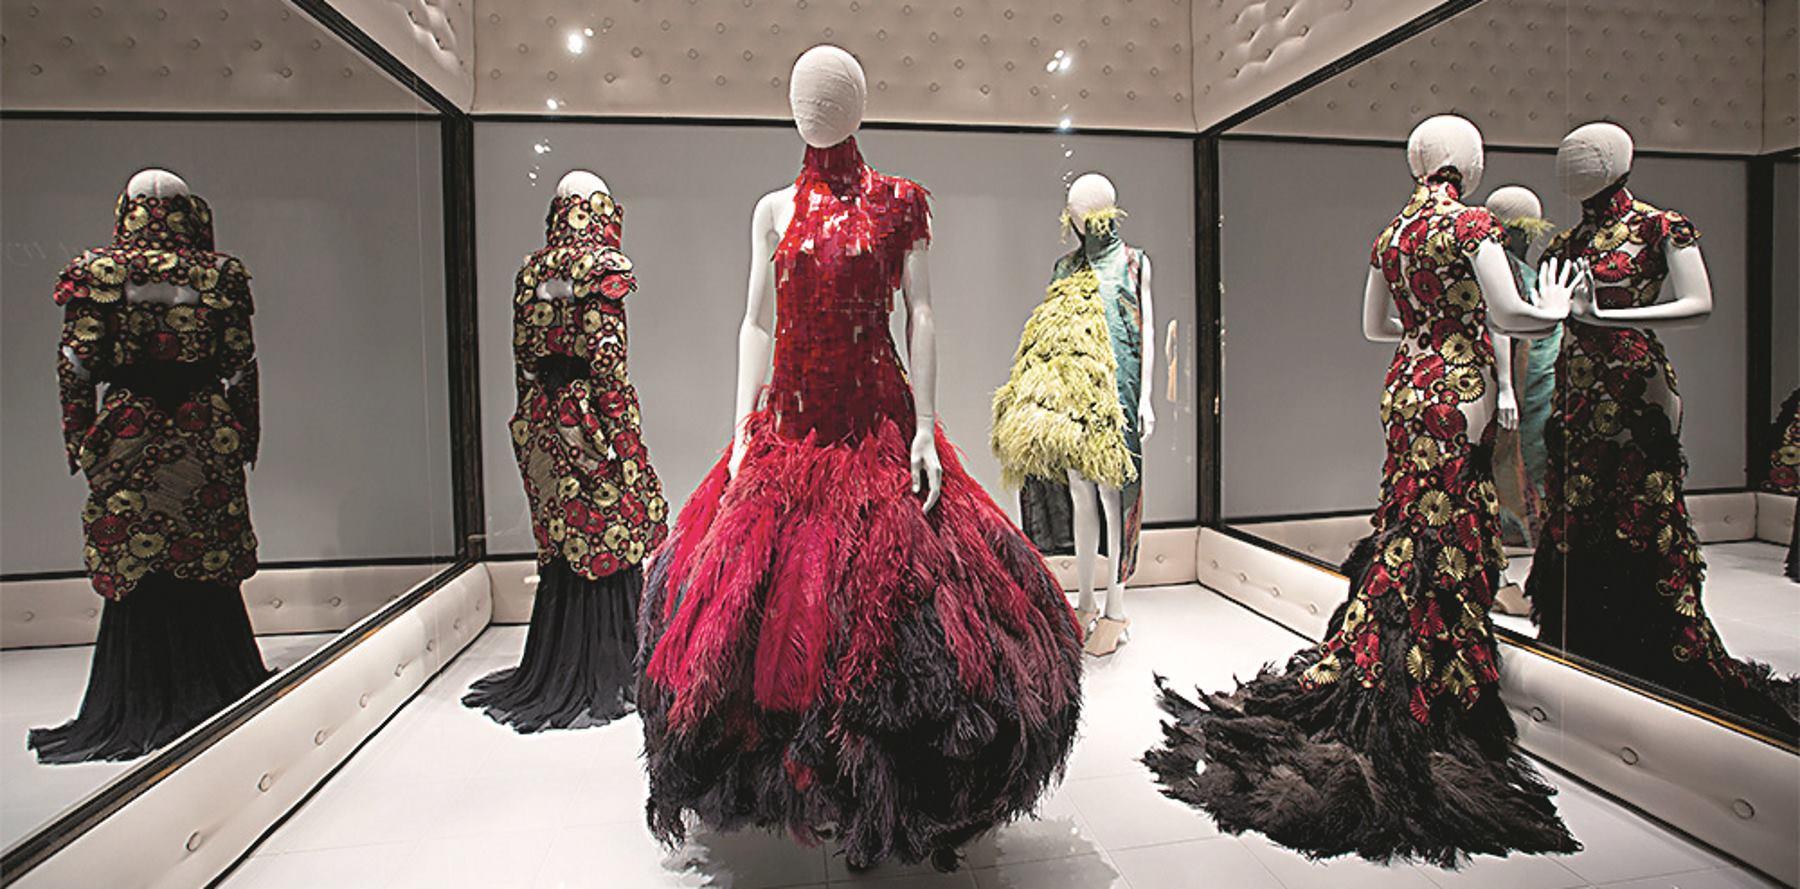 Divlja ljepota modnoga genijalca Alexandera McQueena